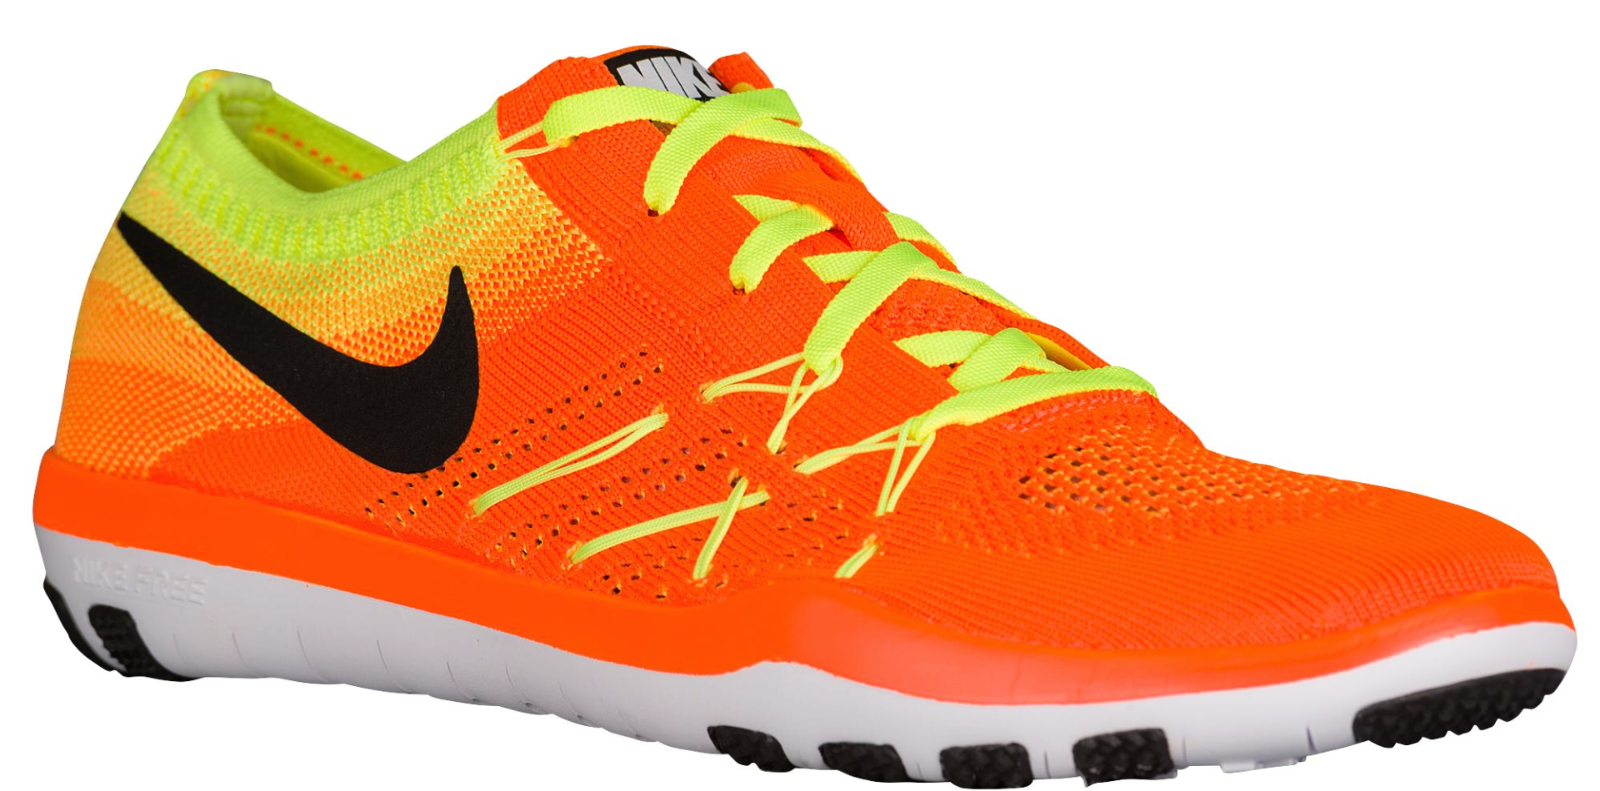 promo code 74873 38a0f Nike Women s Free Transform Focus Flyknit Training Shoes Shoes Shoes cfa75c  ...